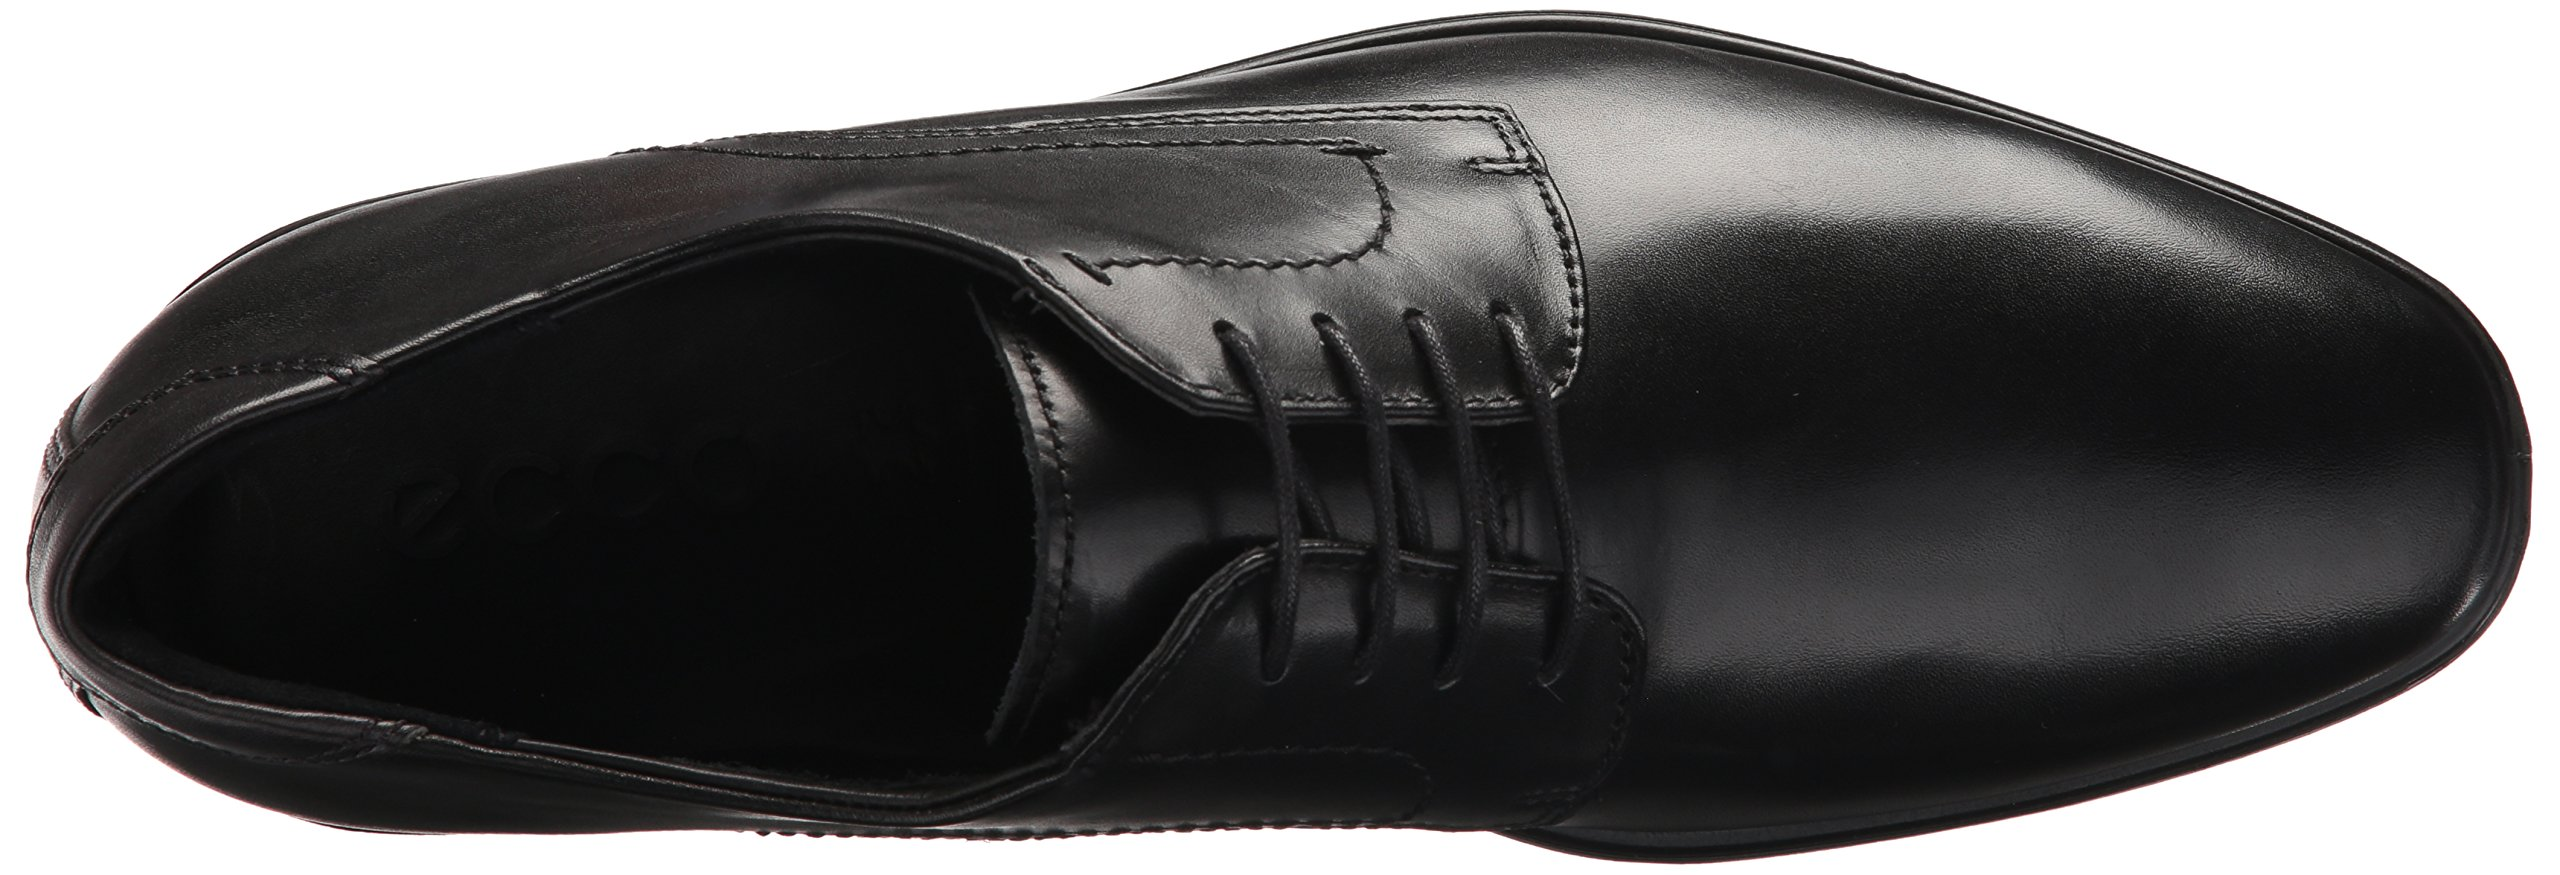 ECCO Men's Melbourne Tie Oxford, Black/Magnet, 43 EU/9-9.5 M US by ECCO (Image #8)